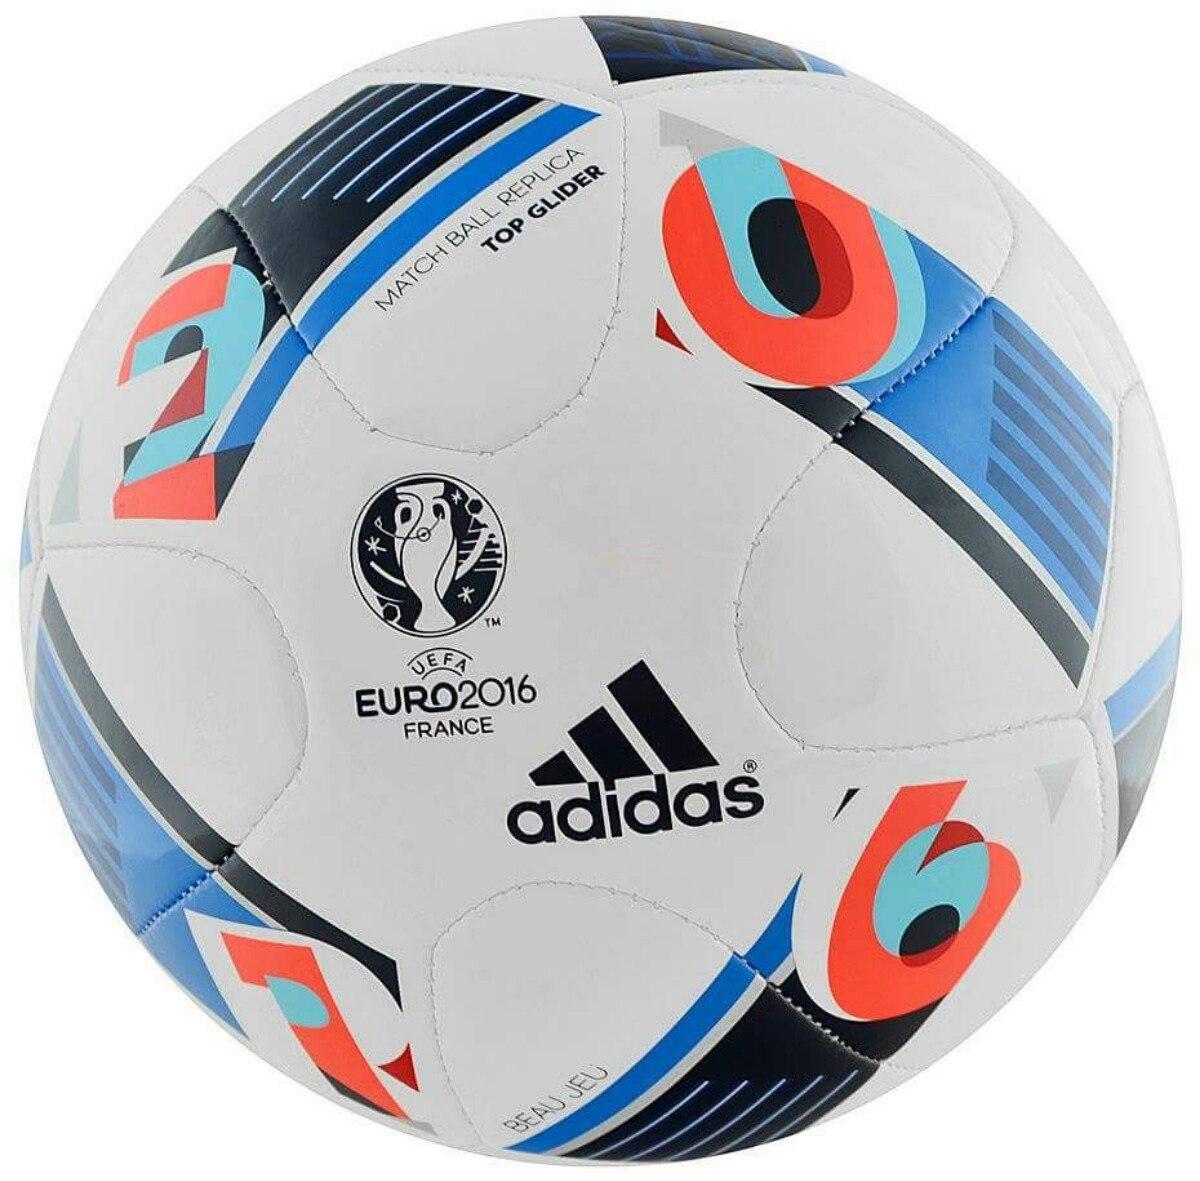 Fotos balones UEFA Eurocopa - Buscar con Google a238d079f452d